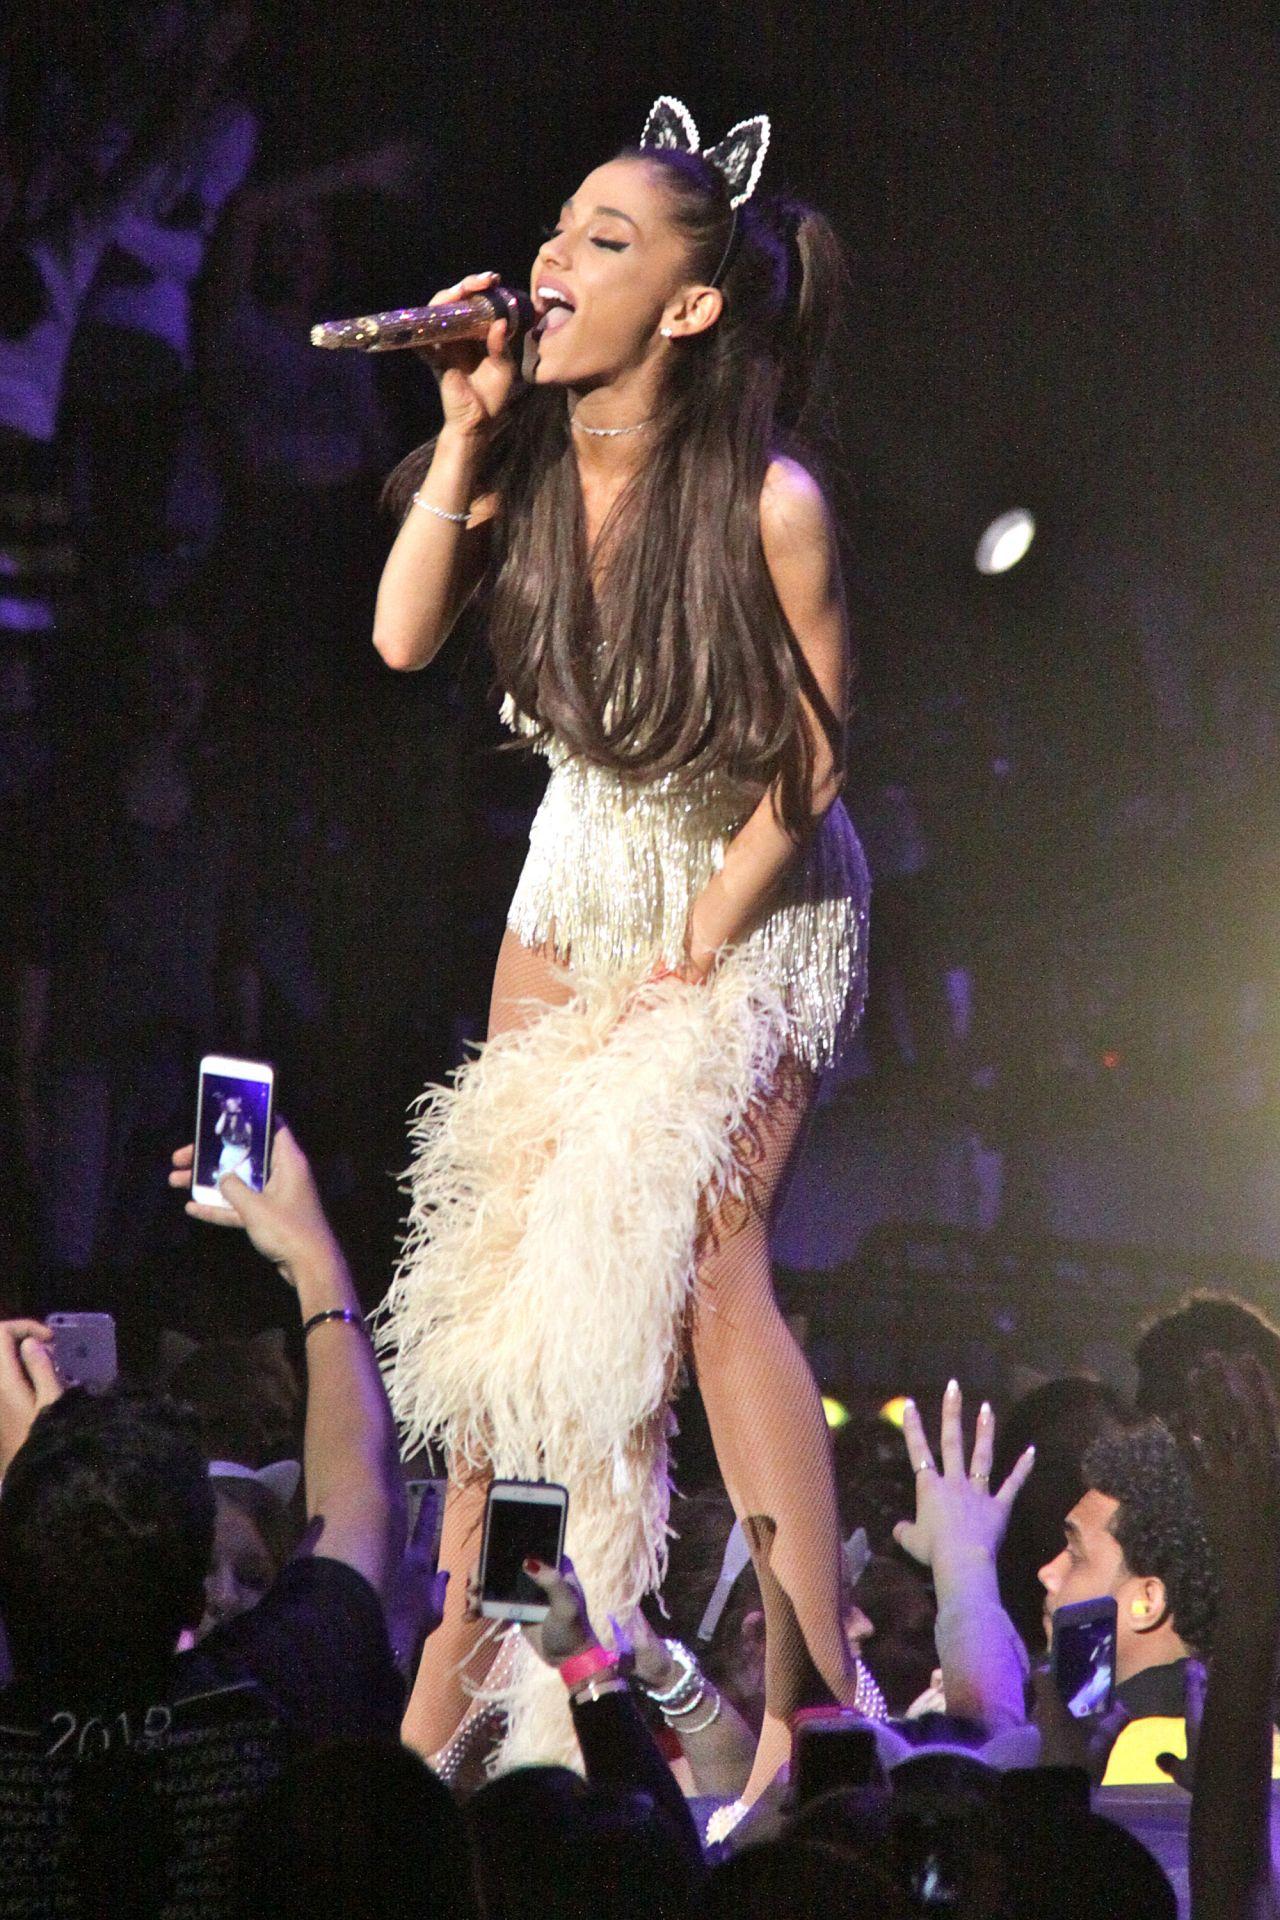 Ariana Grande Performing and Falling in Toronto, March 2015 джастин бибер фильм